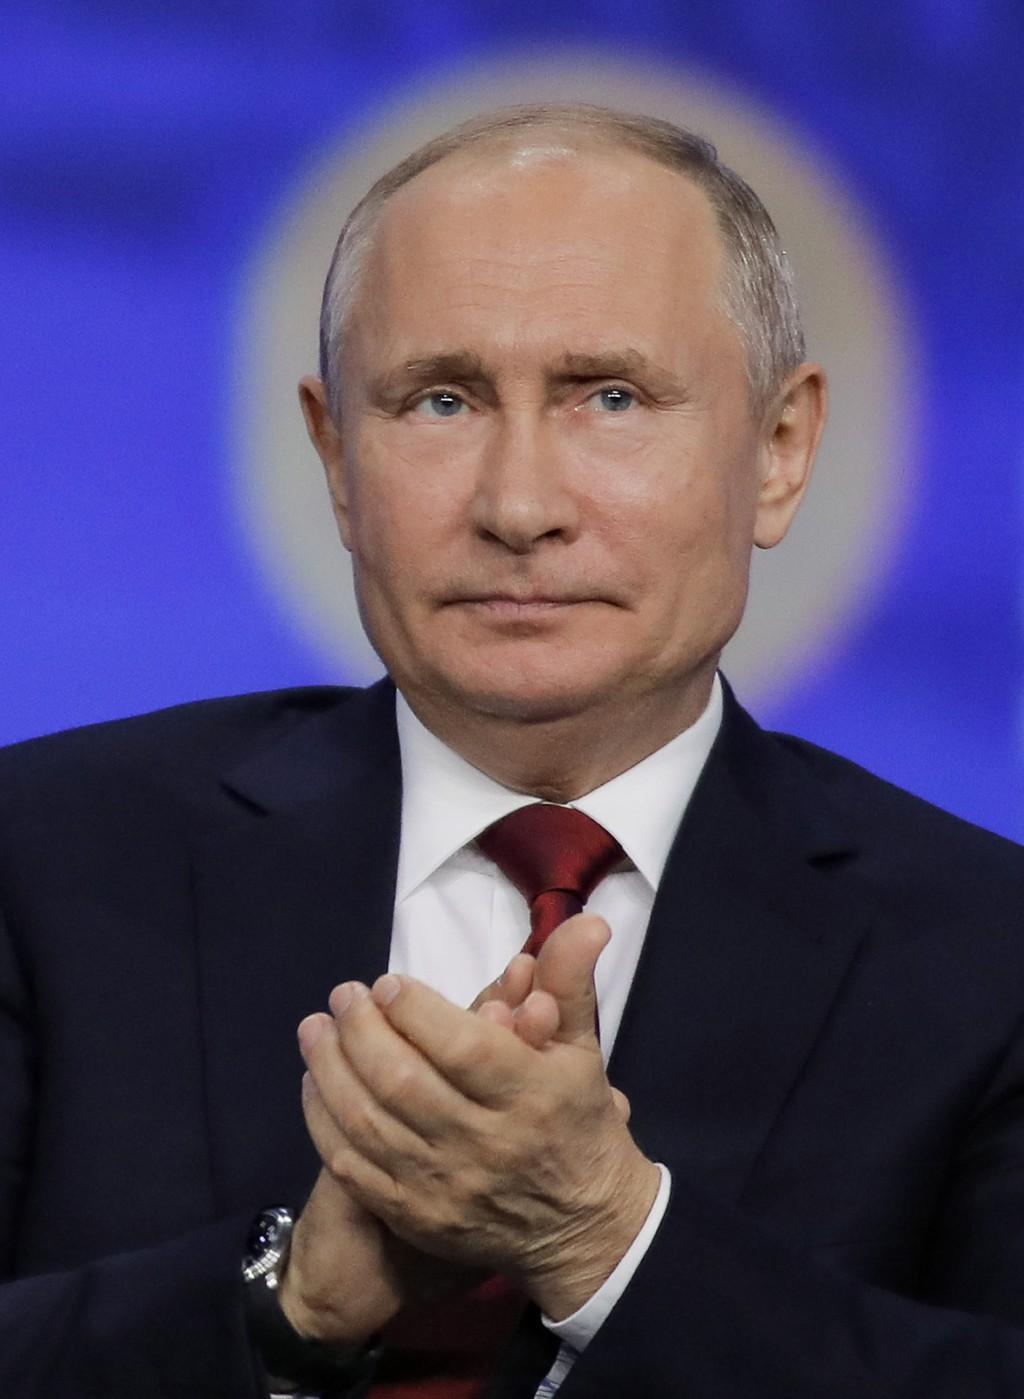 Russian President Vladimir Putin attends the St. Petersburg International Economic Forum in St. Petersburg, Russia, Friday, June 7, 2019. (AP Photo/Dm...